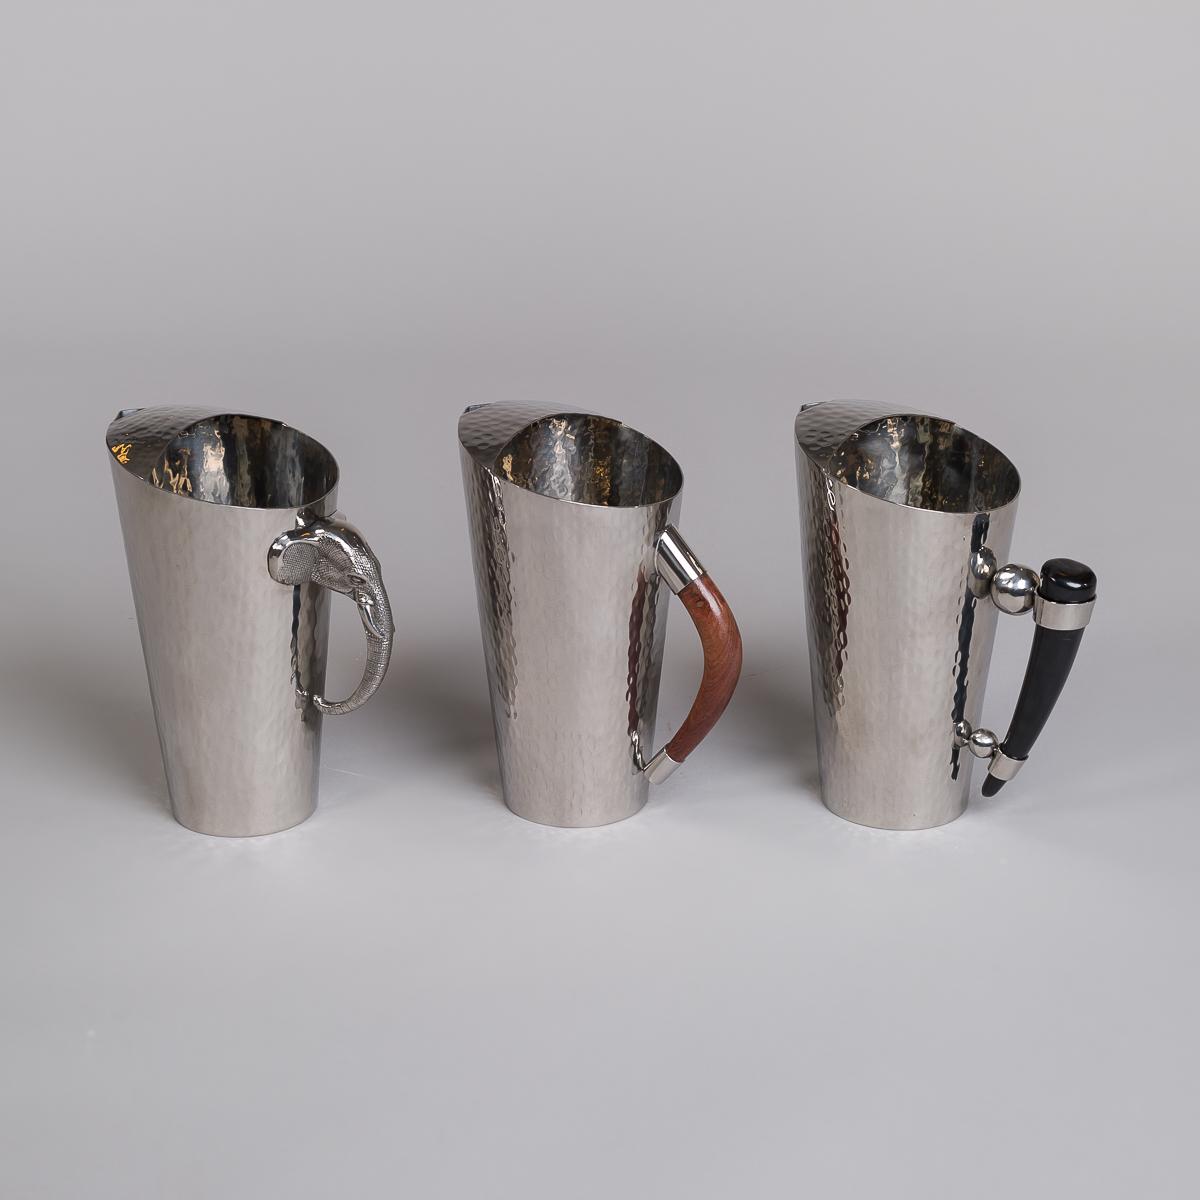 Mugge i rustfritt stål med håndtak i bøffelhorn-41